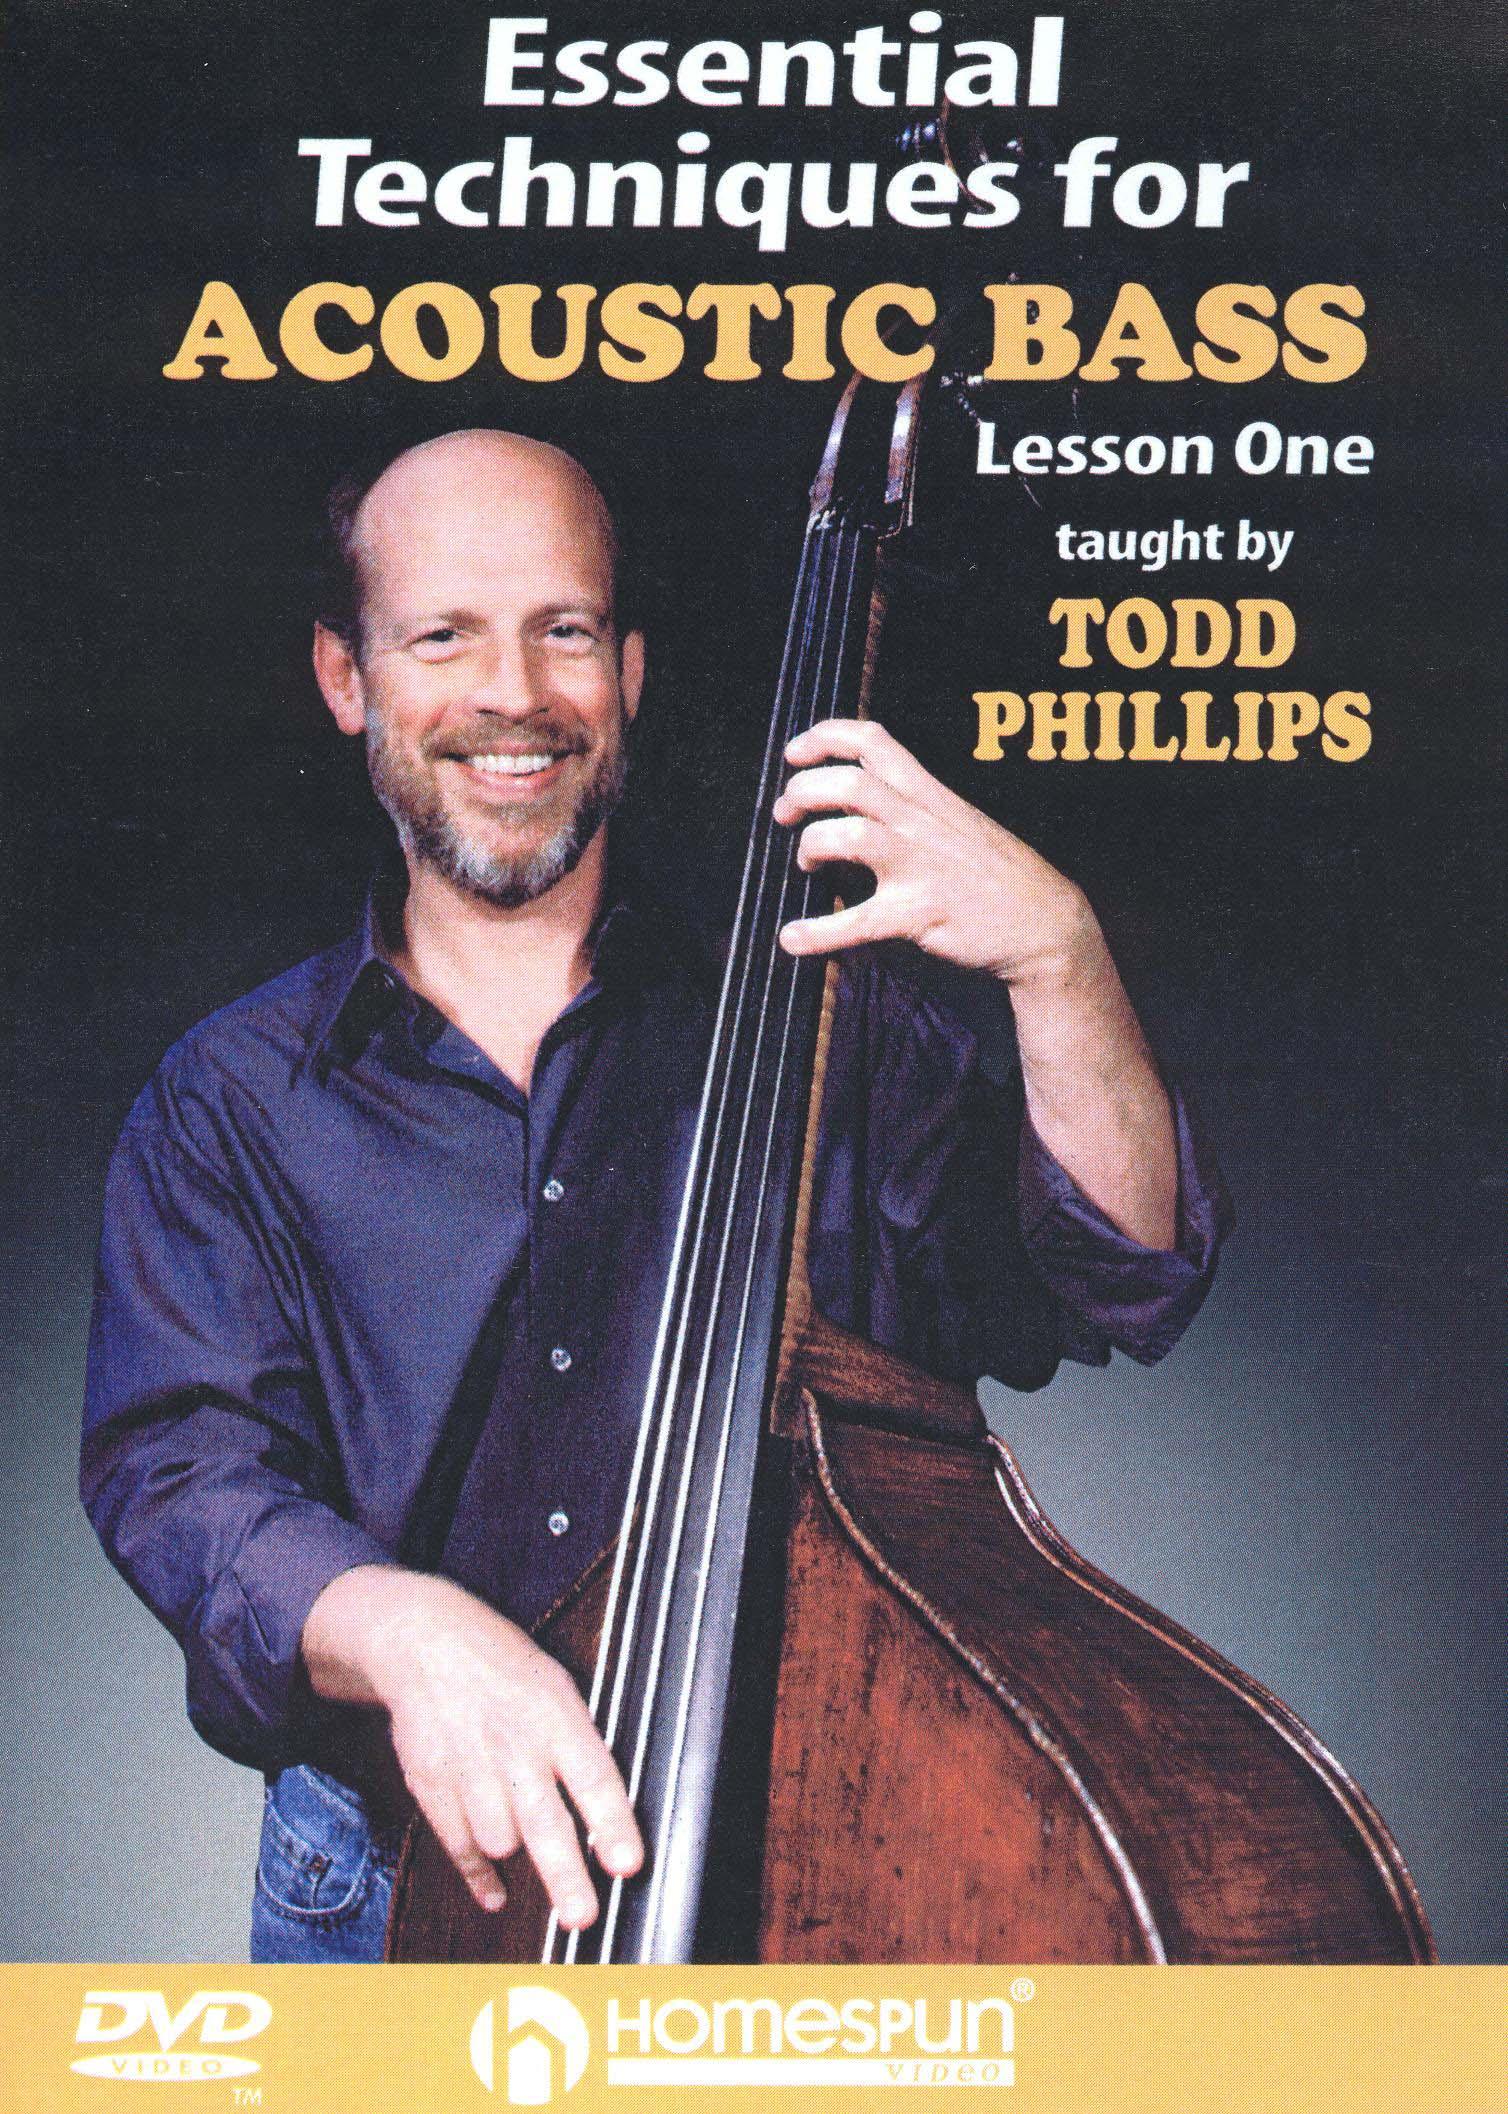 Essential Techniques for Acoustic Bass, Lesson 1